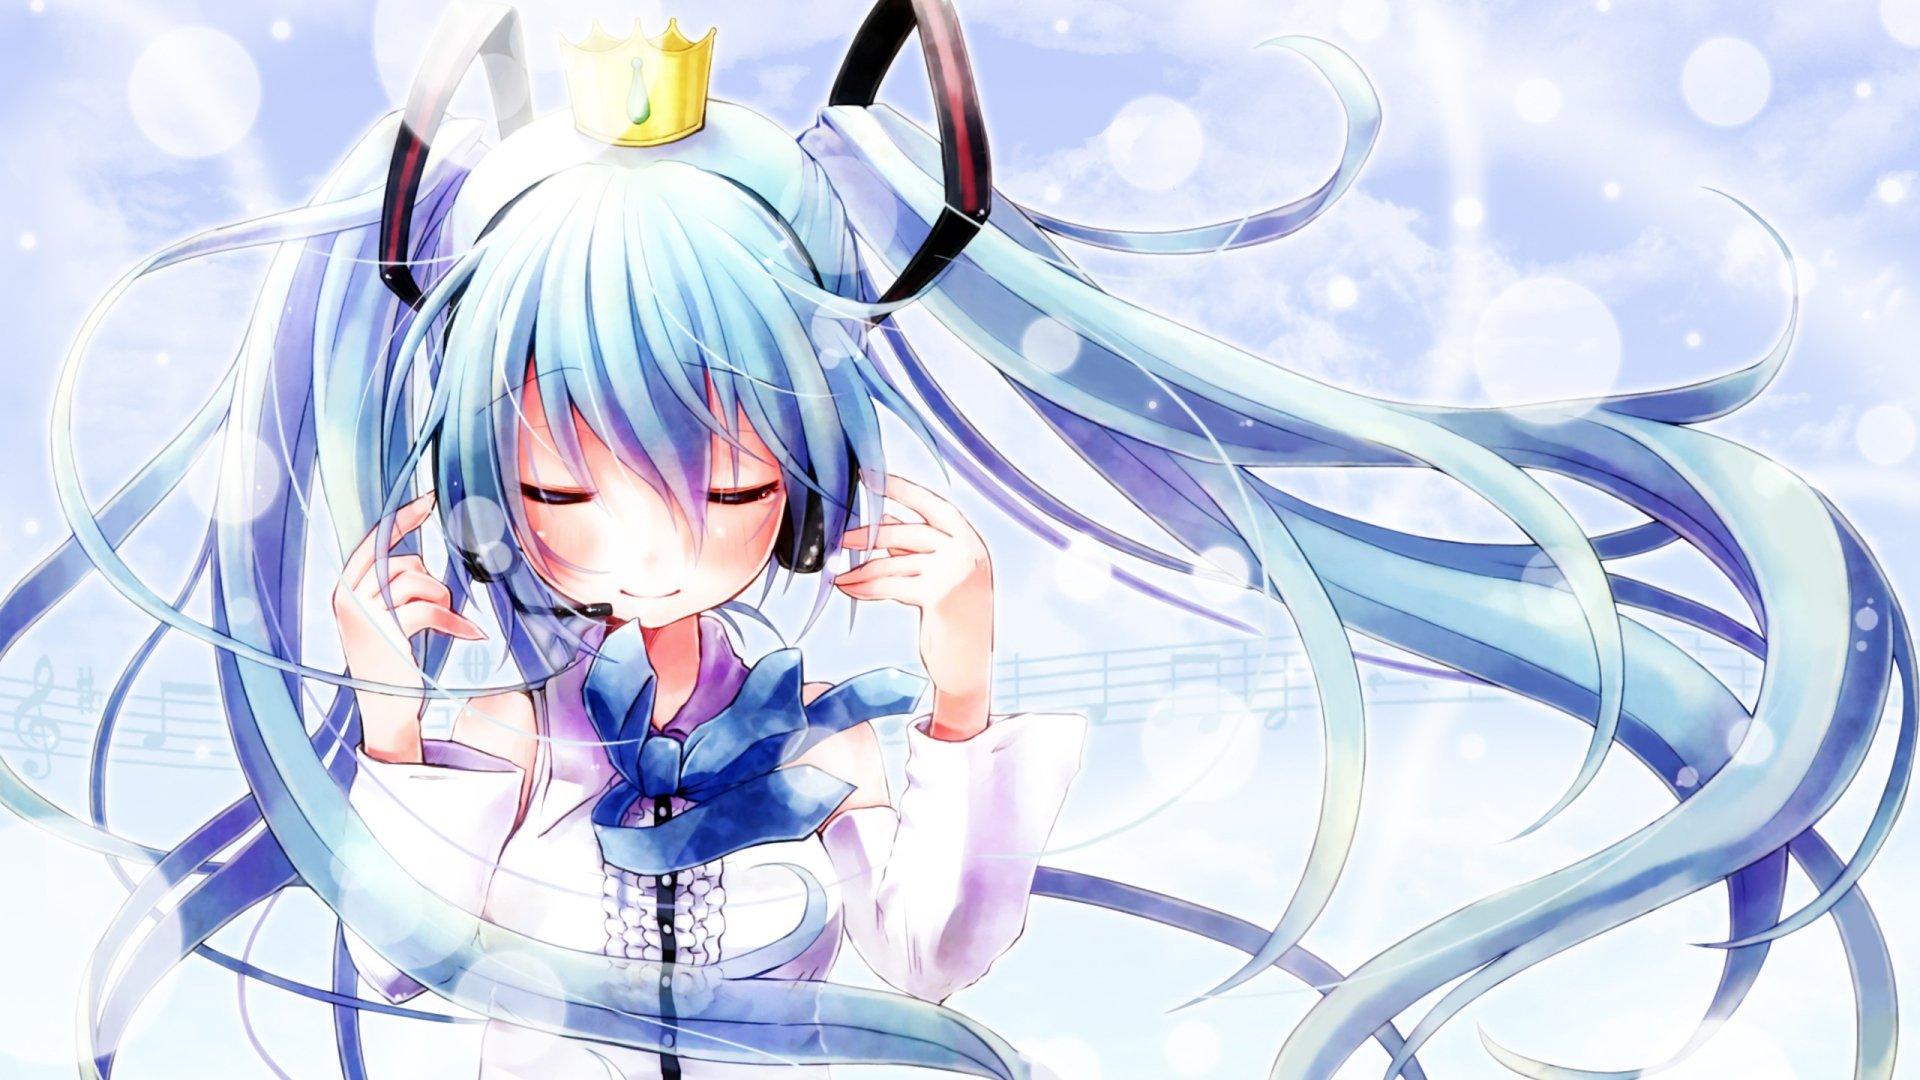 Anime - Vocaloid  Crown Hatsune Miku Wallpaper